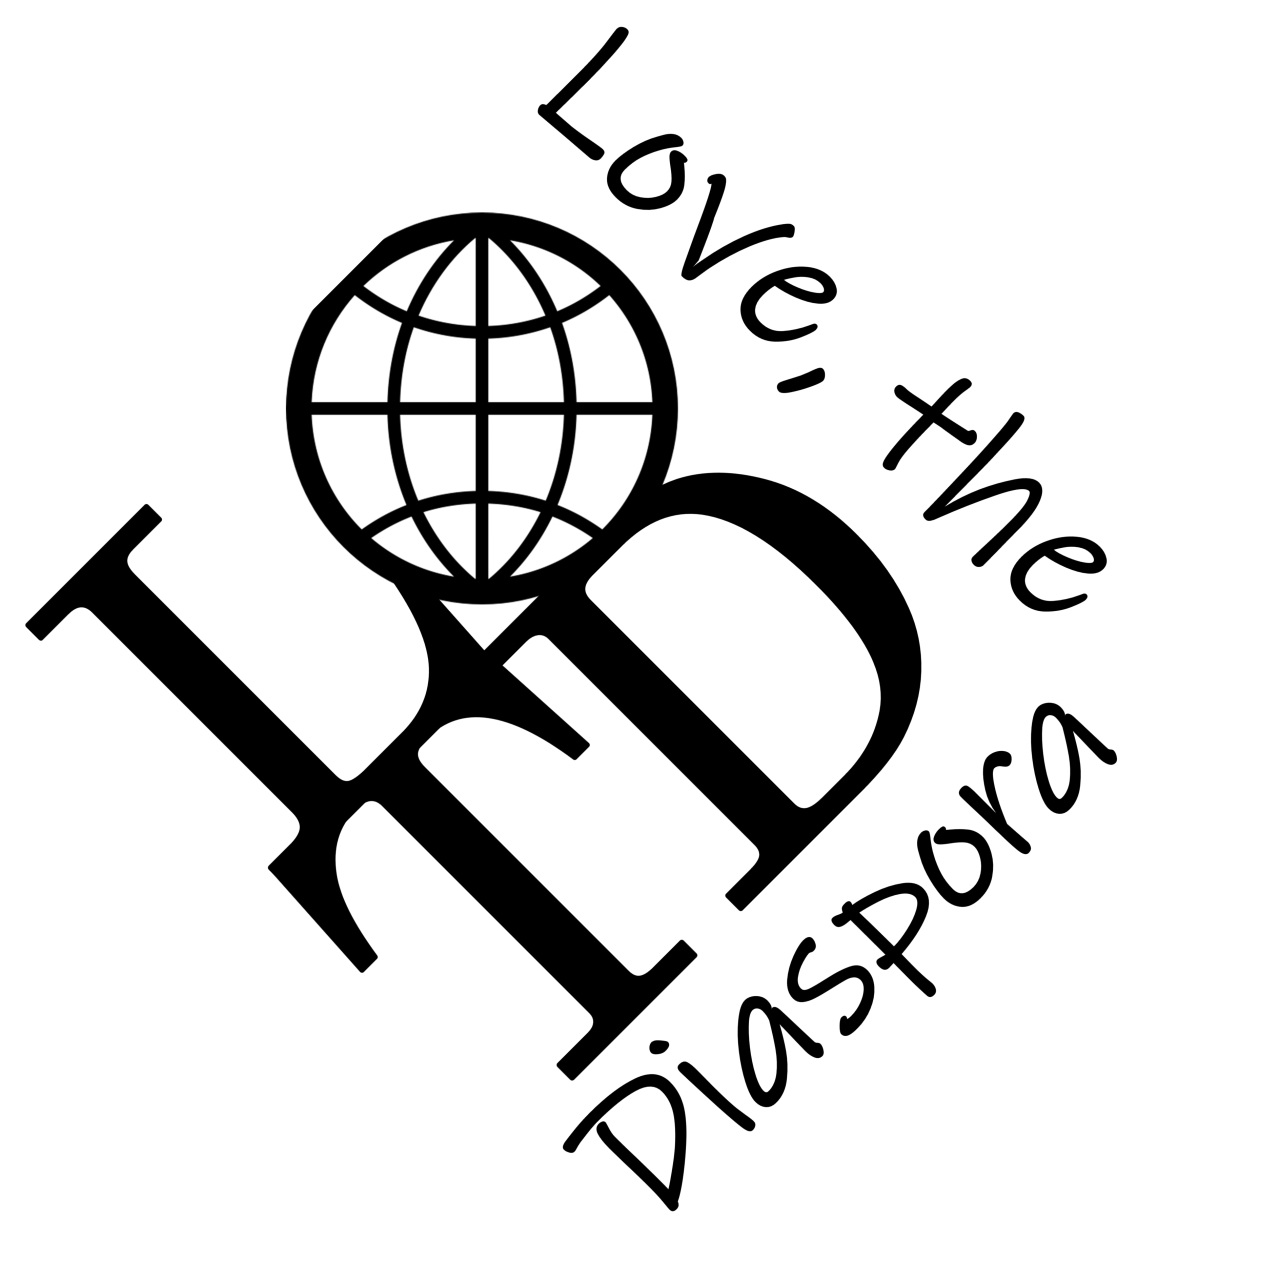 LovetheDiaspora_LOGO.jpg